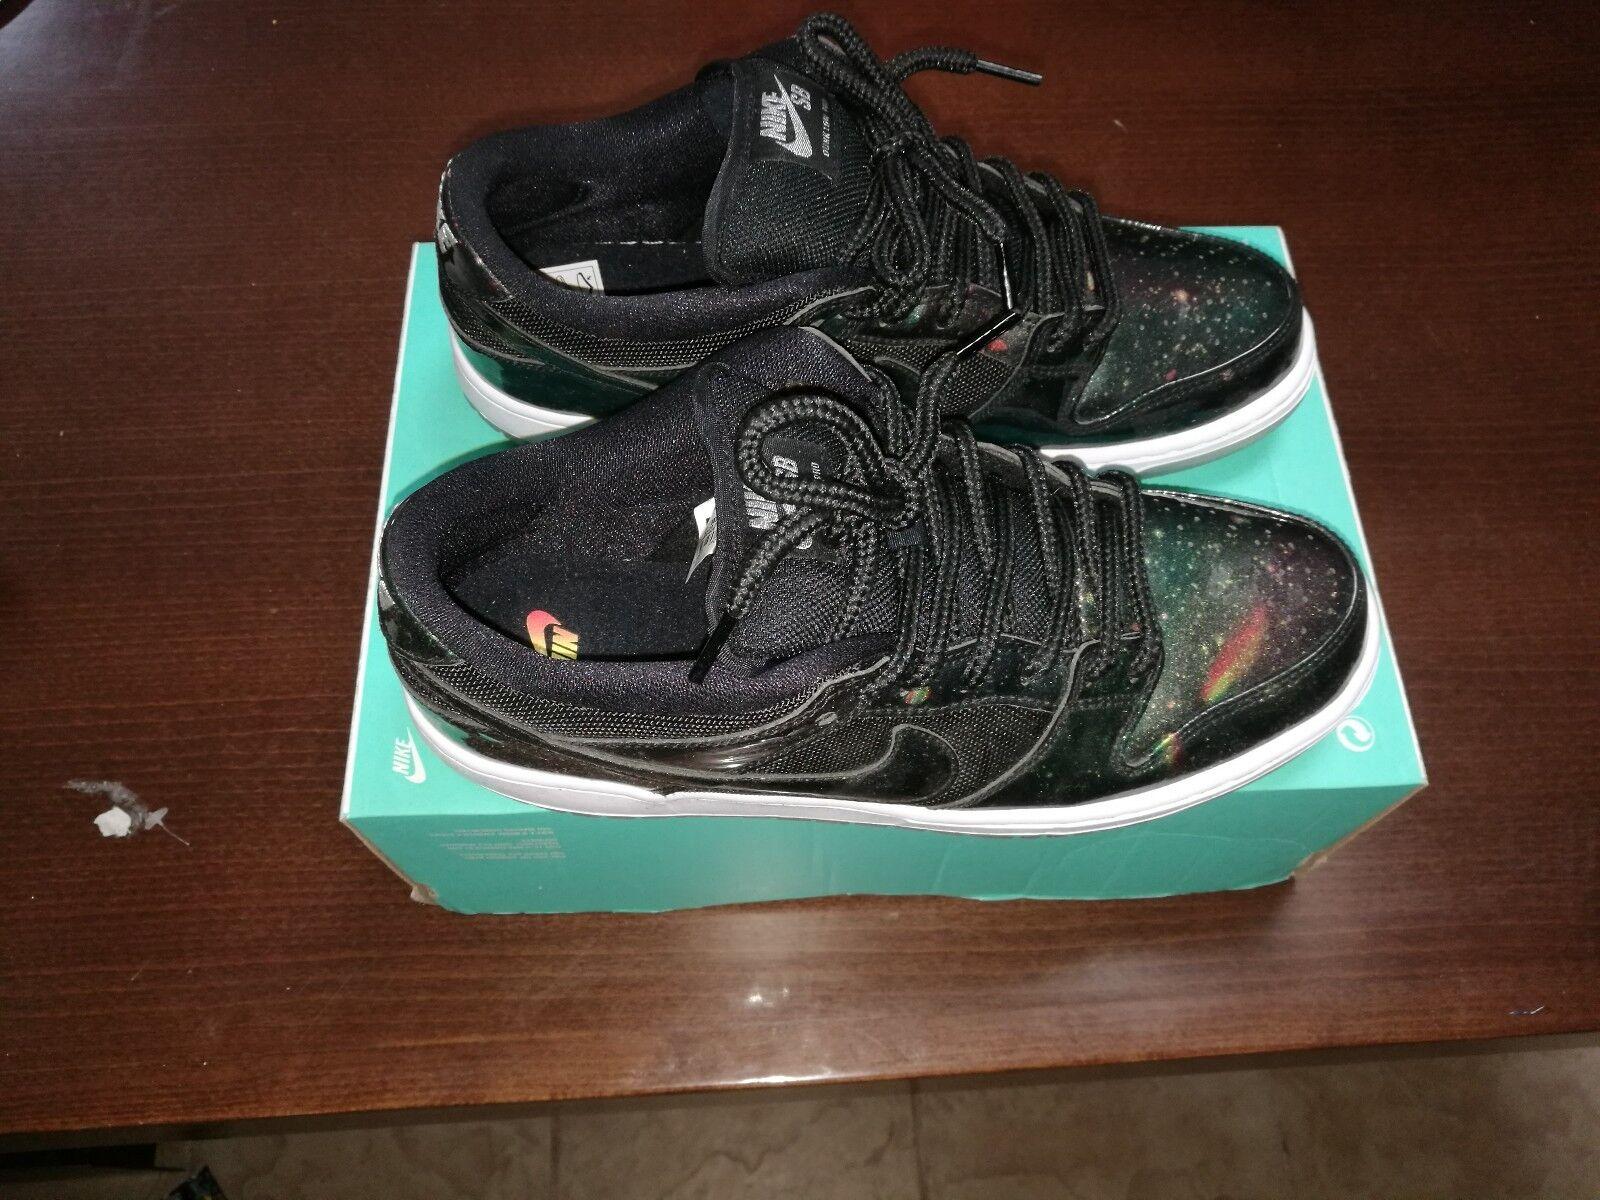 !! rara!!! Nuevo Nike Qs SB Dunk Low TRD Qs Nike nosotros tamaño 10 d4e65a